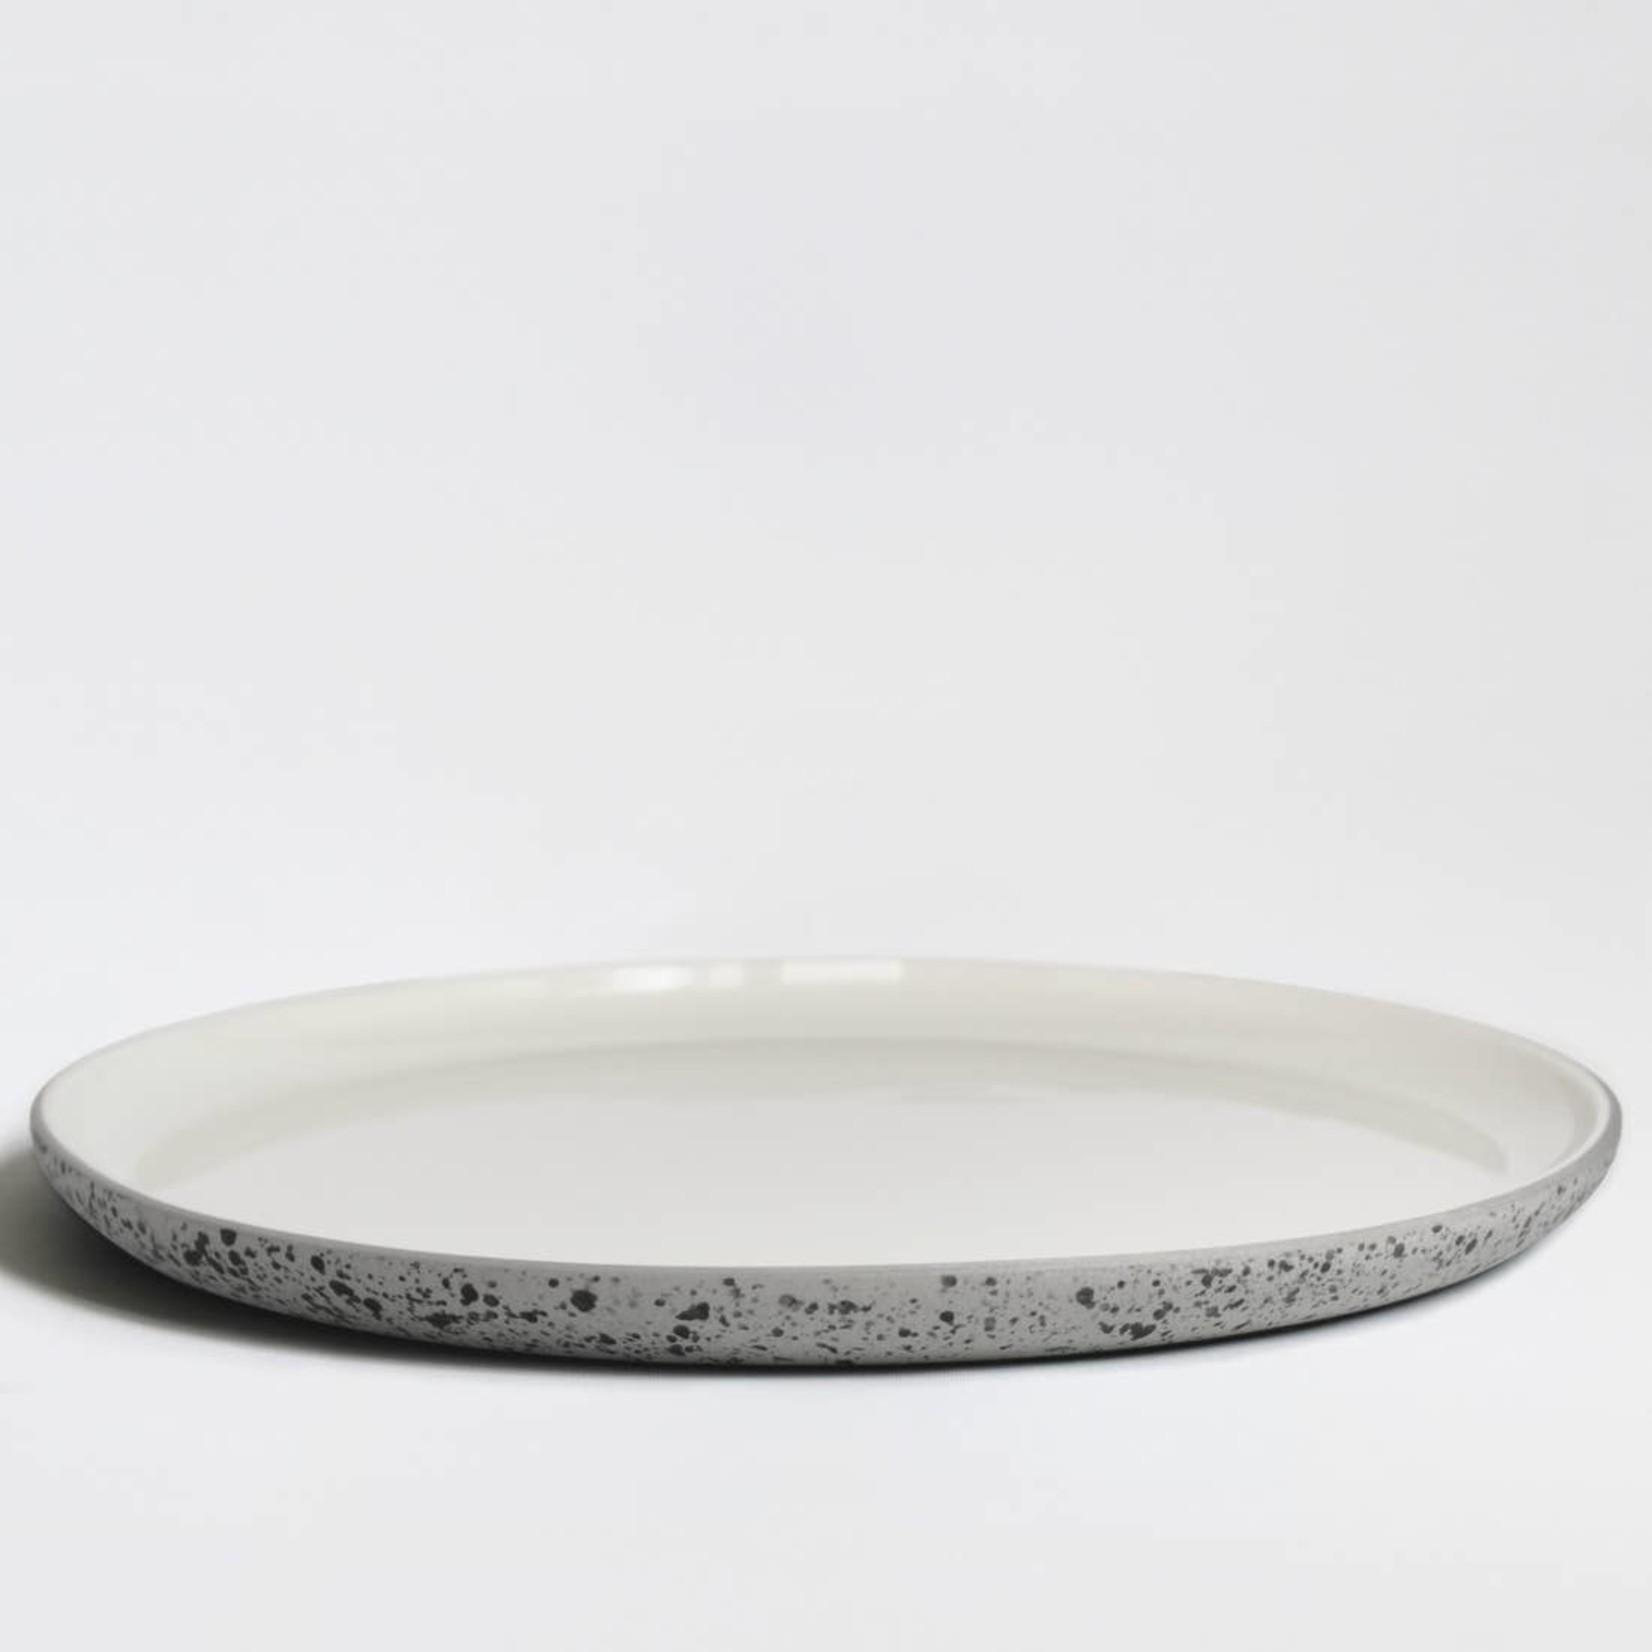 "Archive Studio Archive Studio Handmade Plate 10"" Speckled"